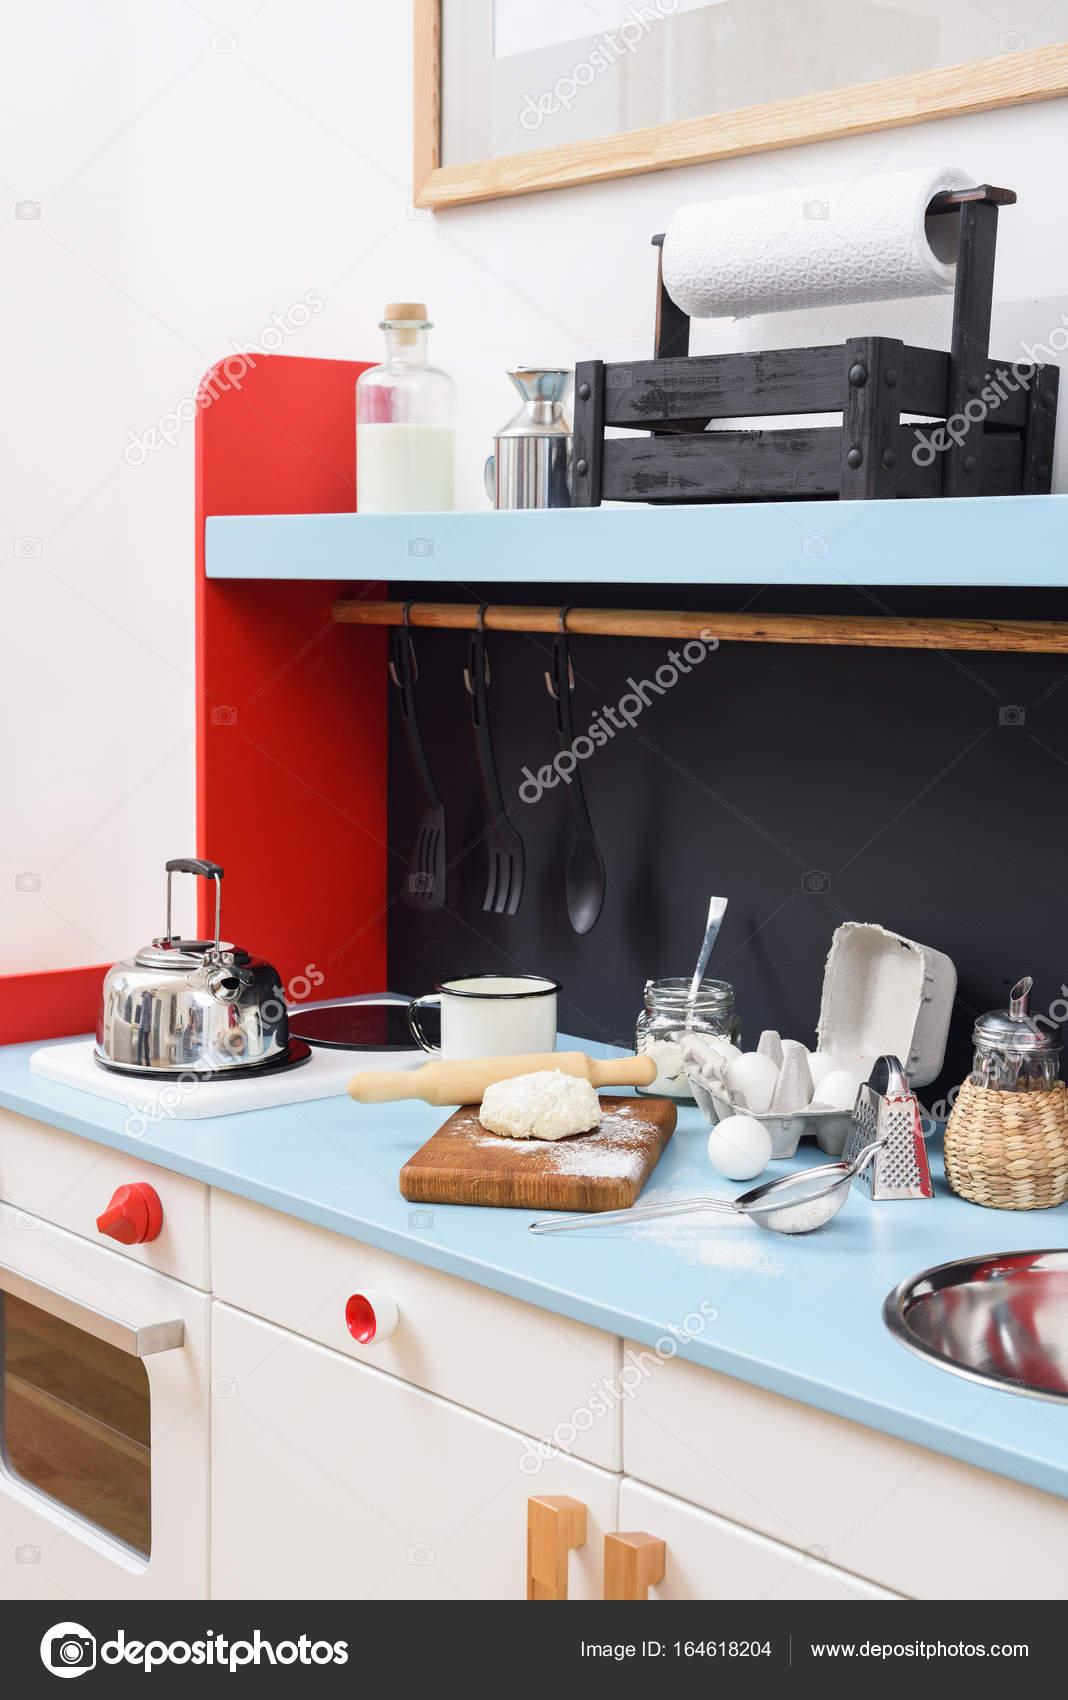 Fotos Cocina Para Descargar Juegos De Cocina Para Ninos Con